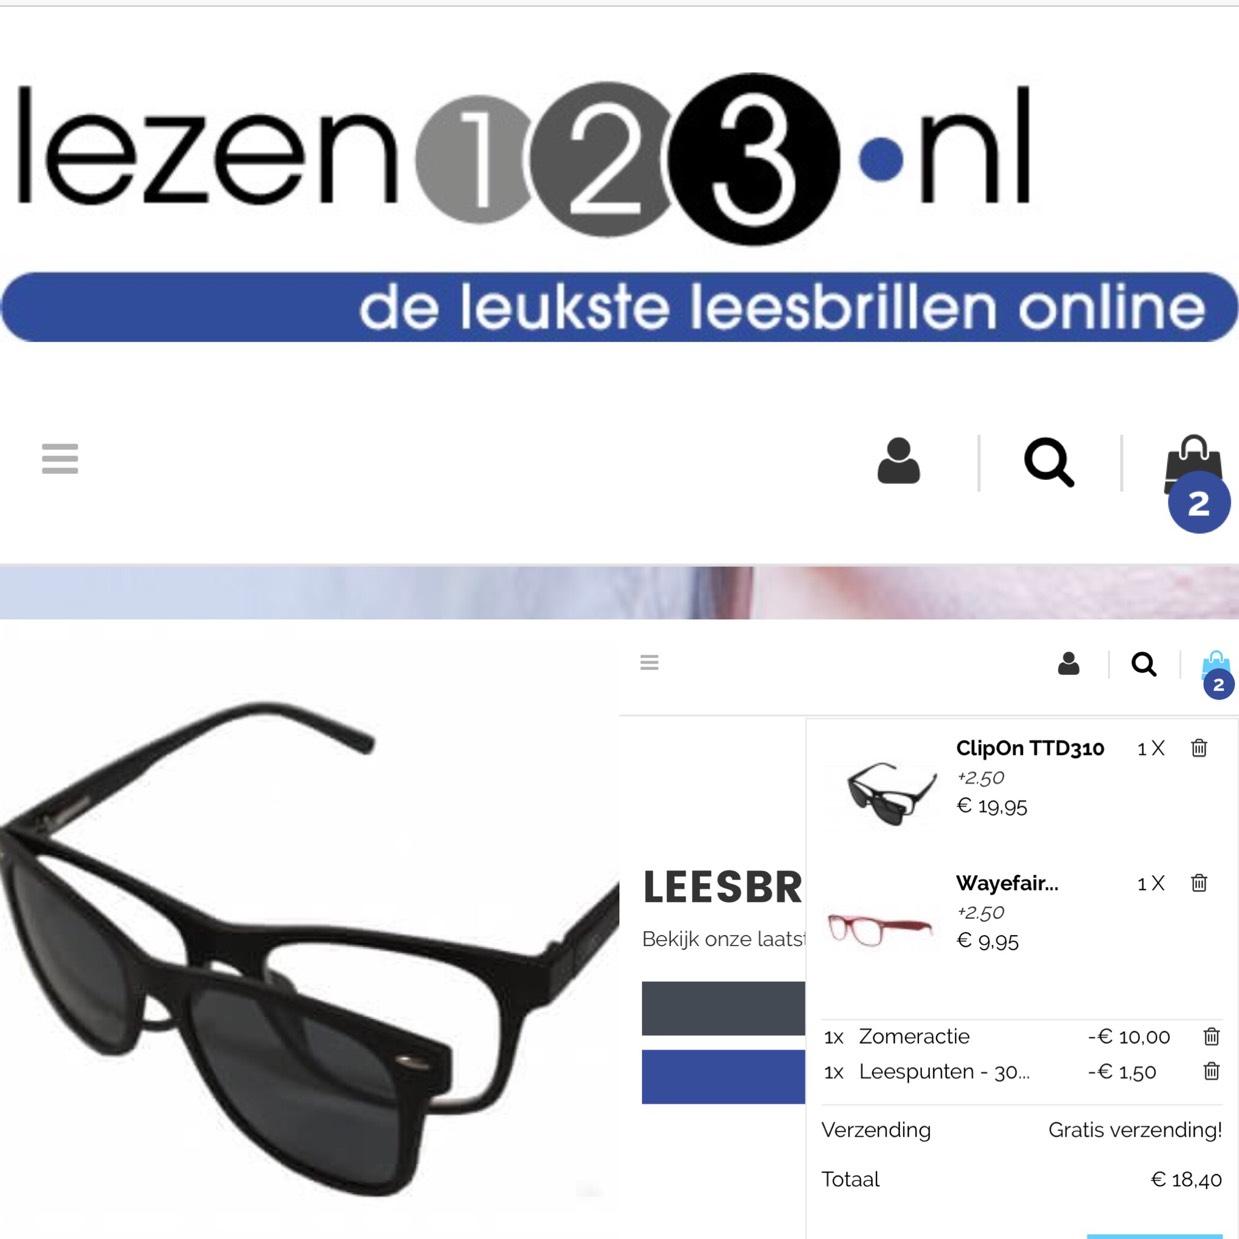 9,95 ClipOn 2in1 (zonne)leesbril @Lezen123